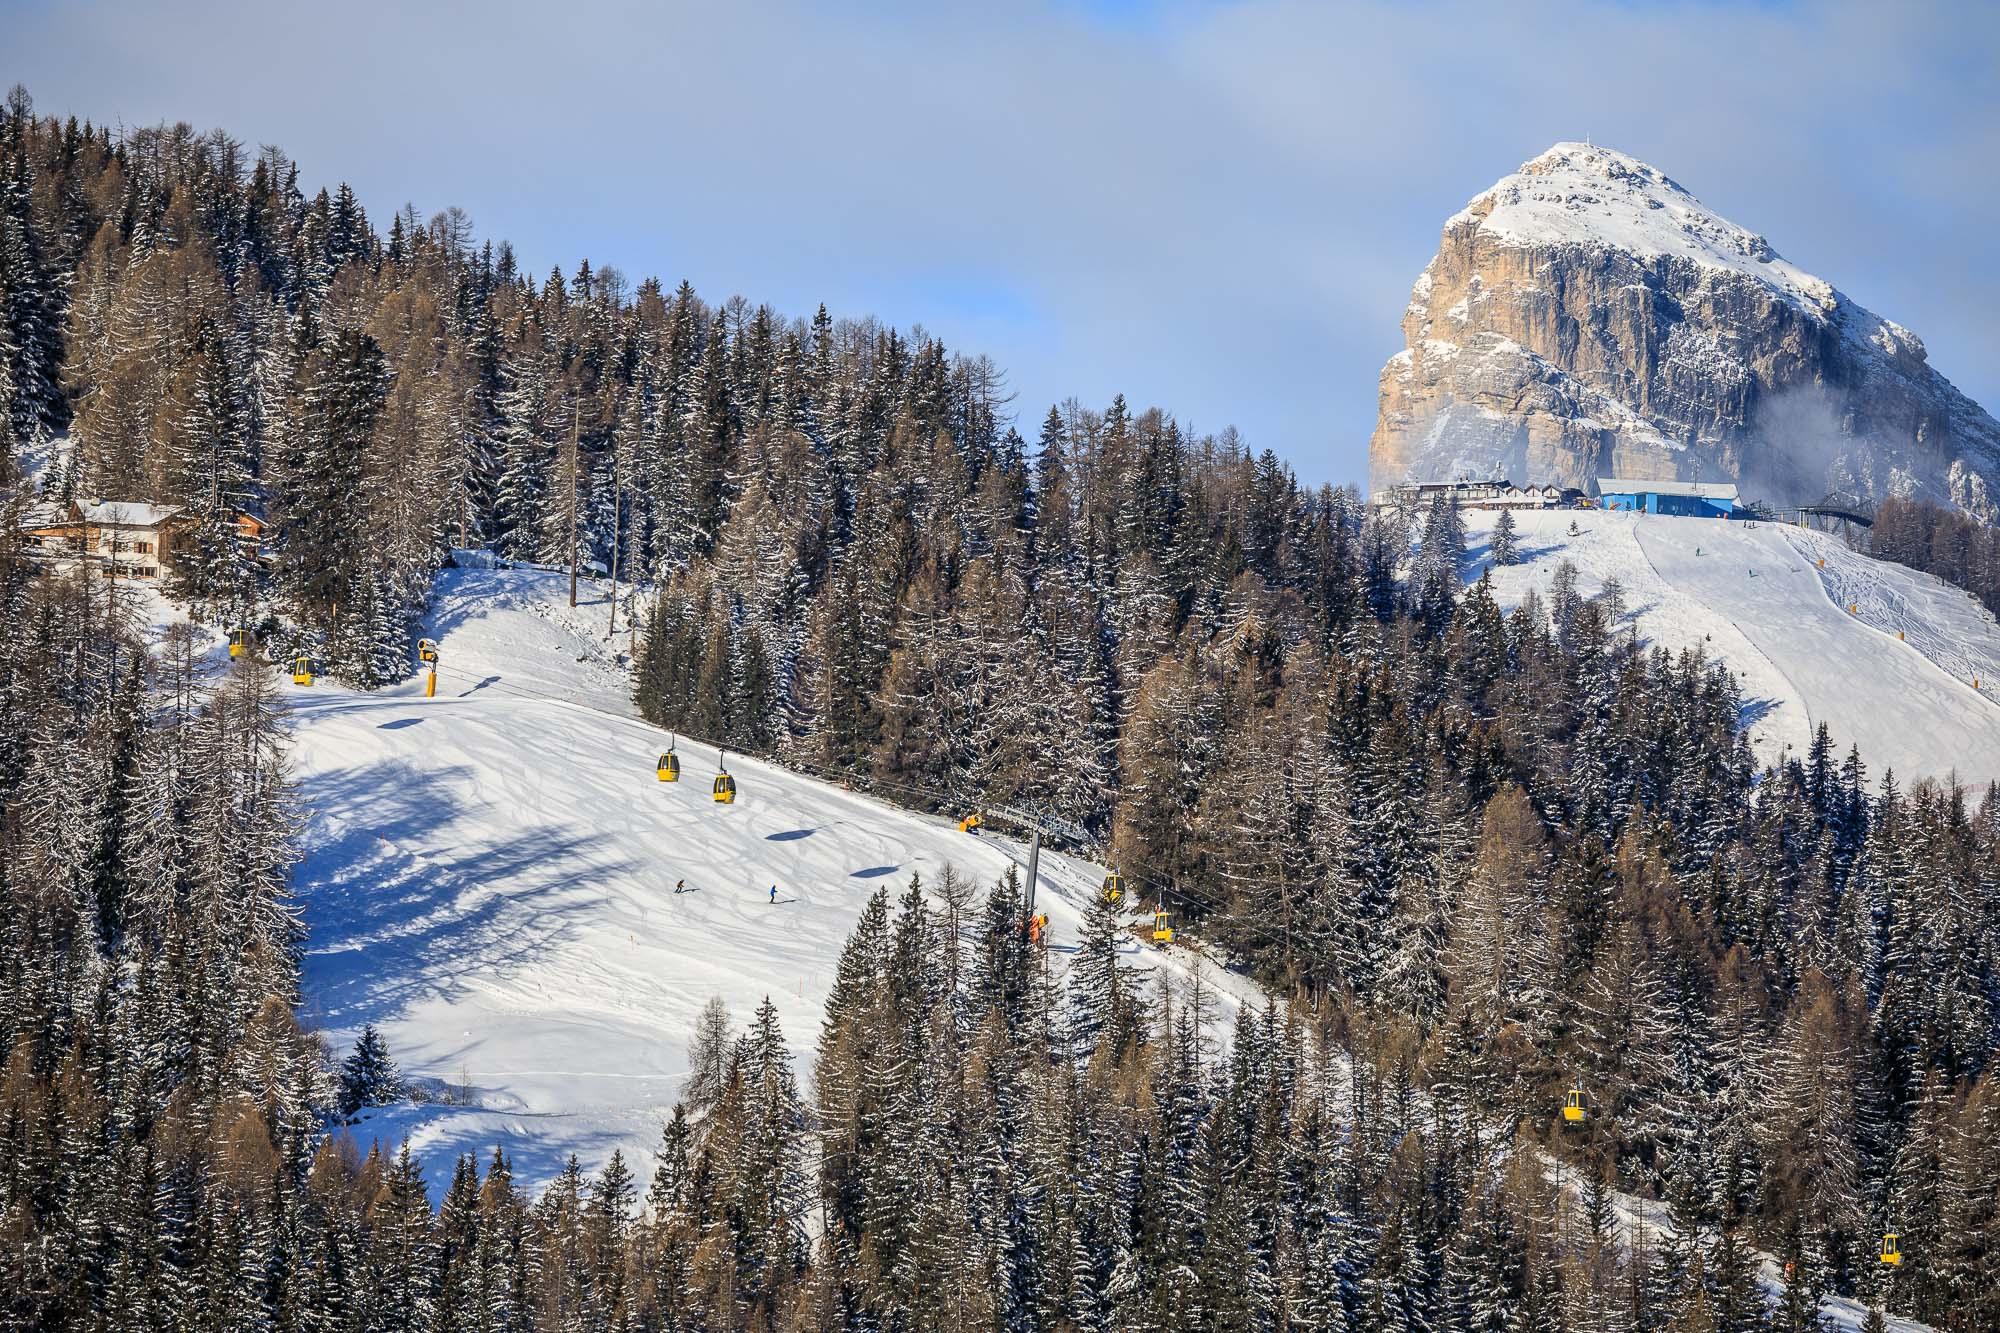 Dolomites, Italy - www.jusmedic.com